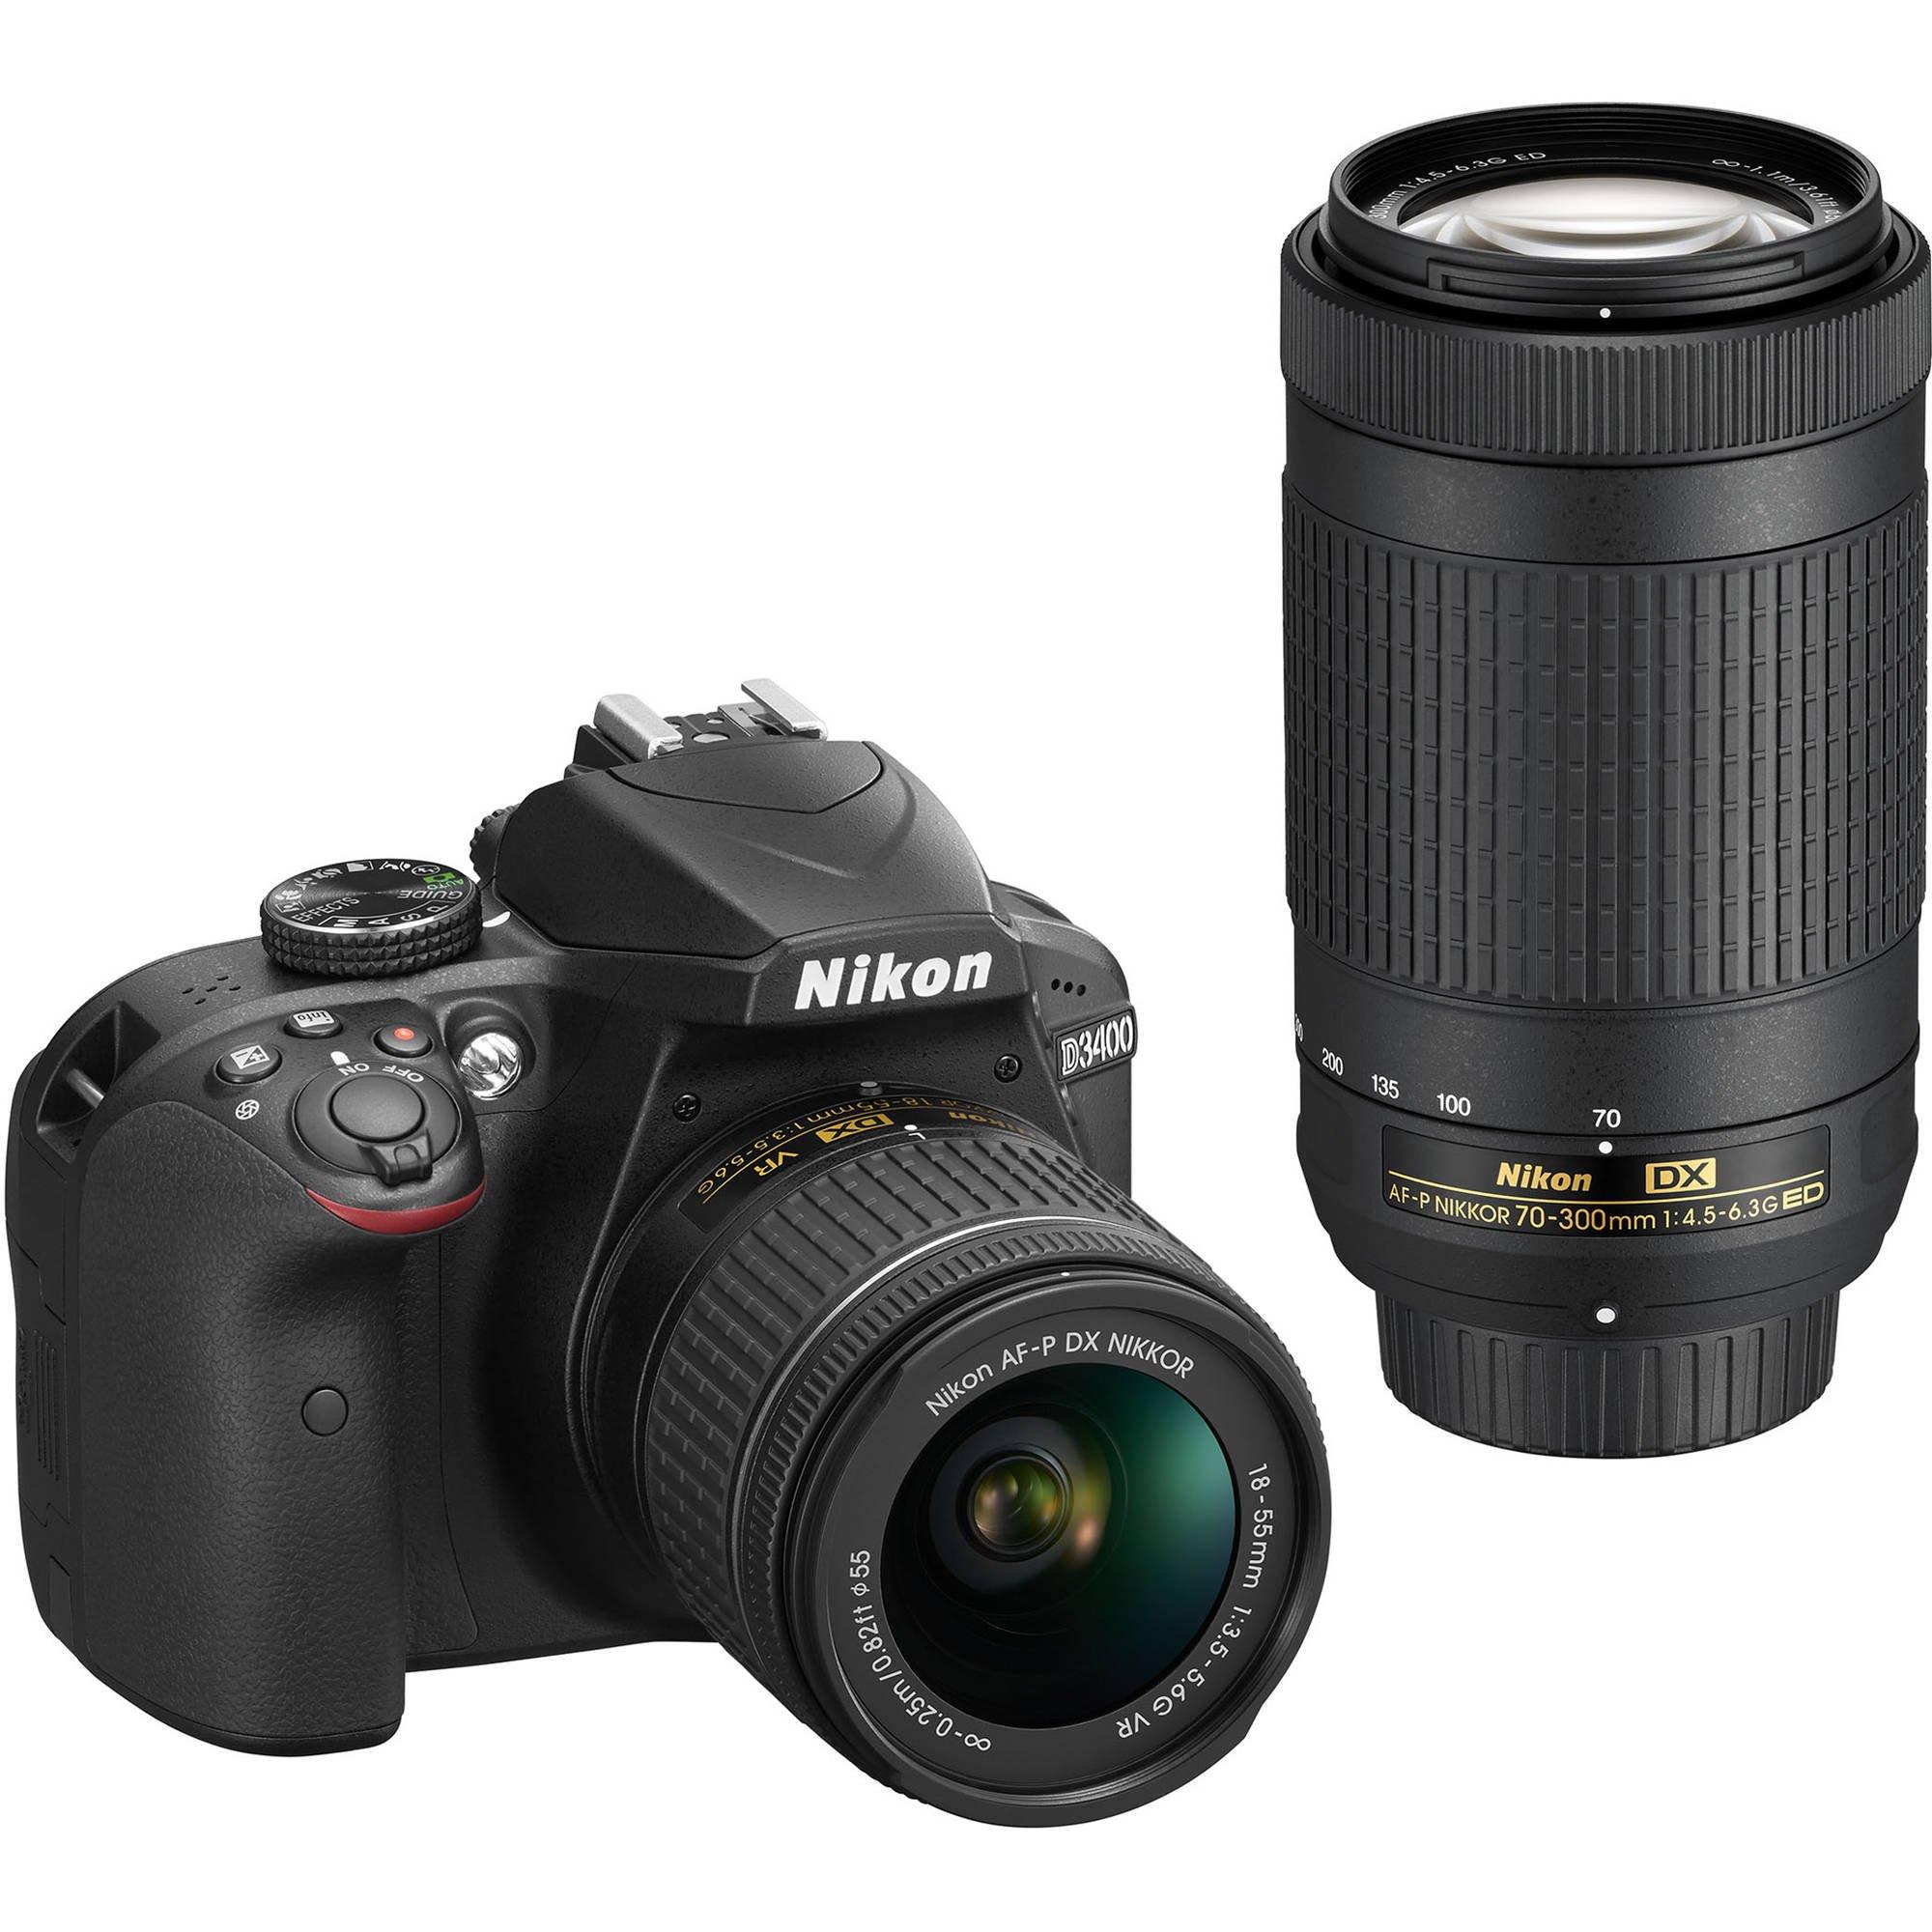 Nikon D3400 DSLR Camera w/ AF-P DX NIKKOR 18-55mm f/3.5-5.6G VR and 70-300mm f/4.5-6.3G ED Lens - Black (Certified Refurbished) by Nikon